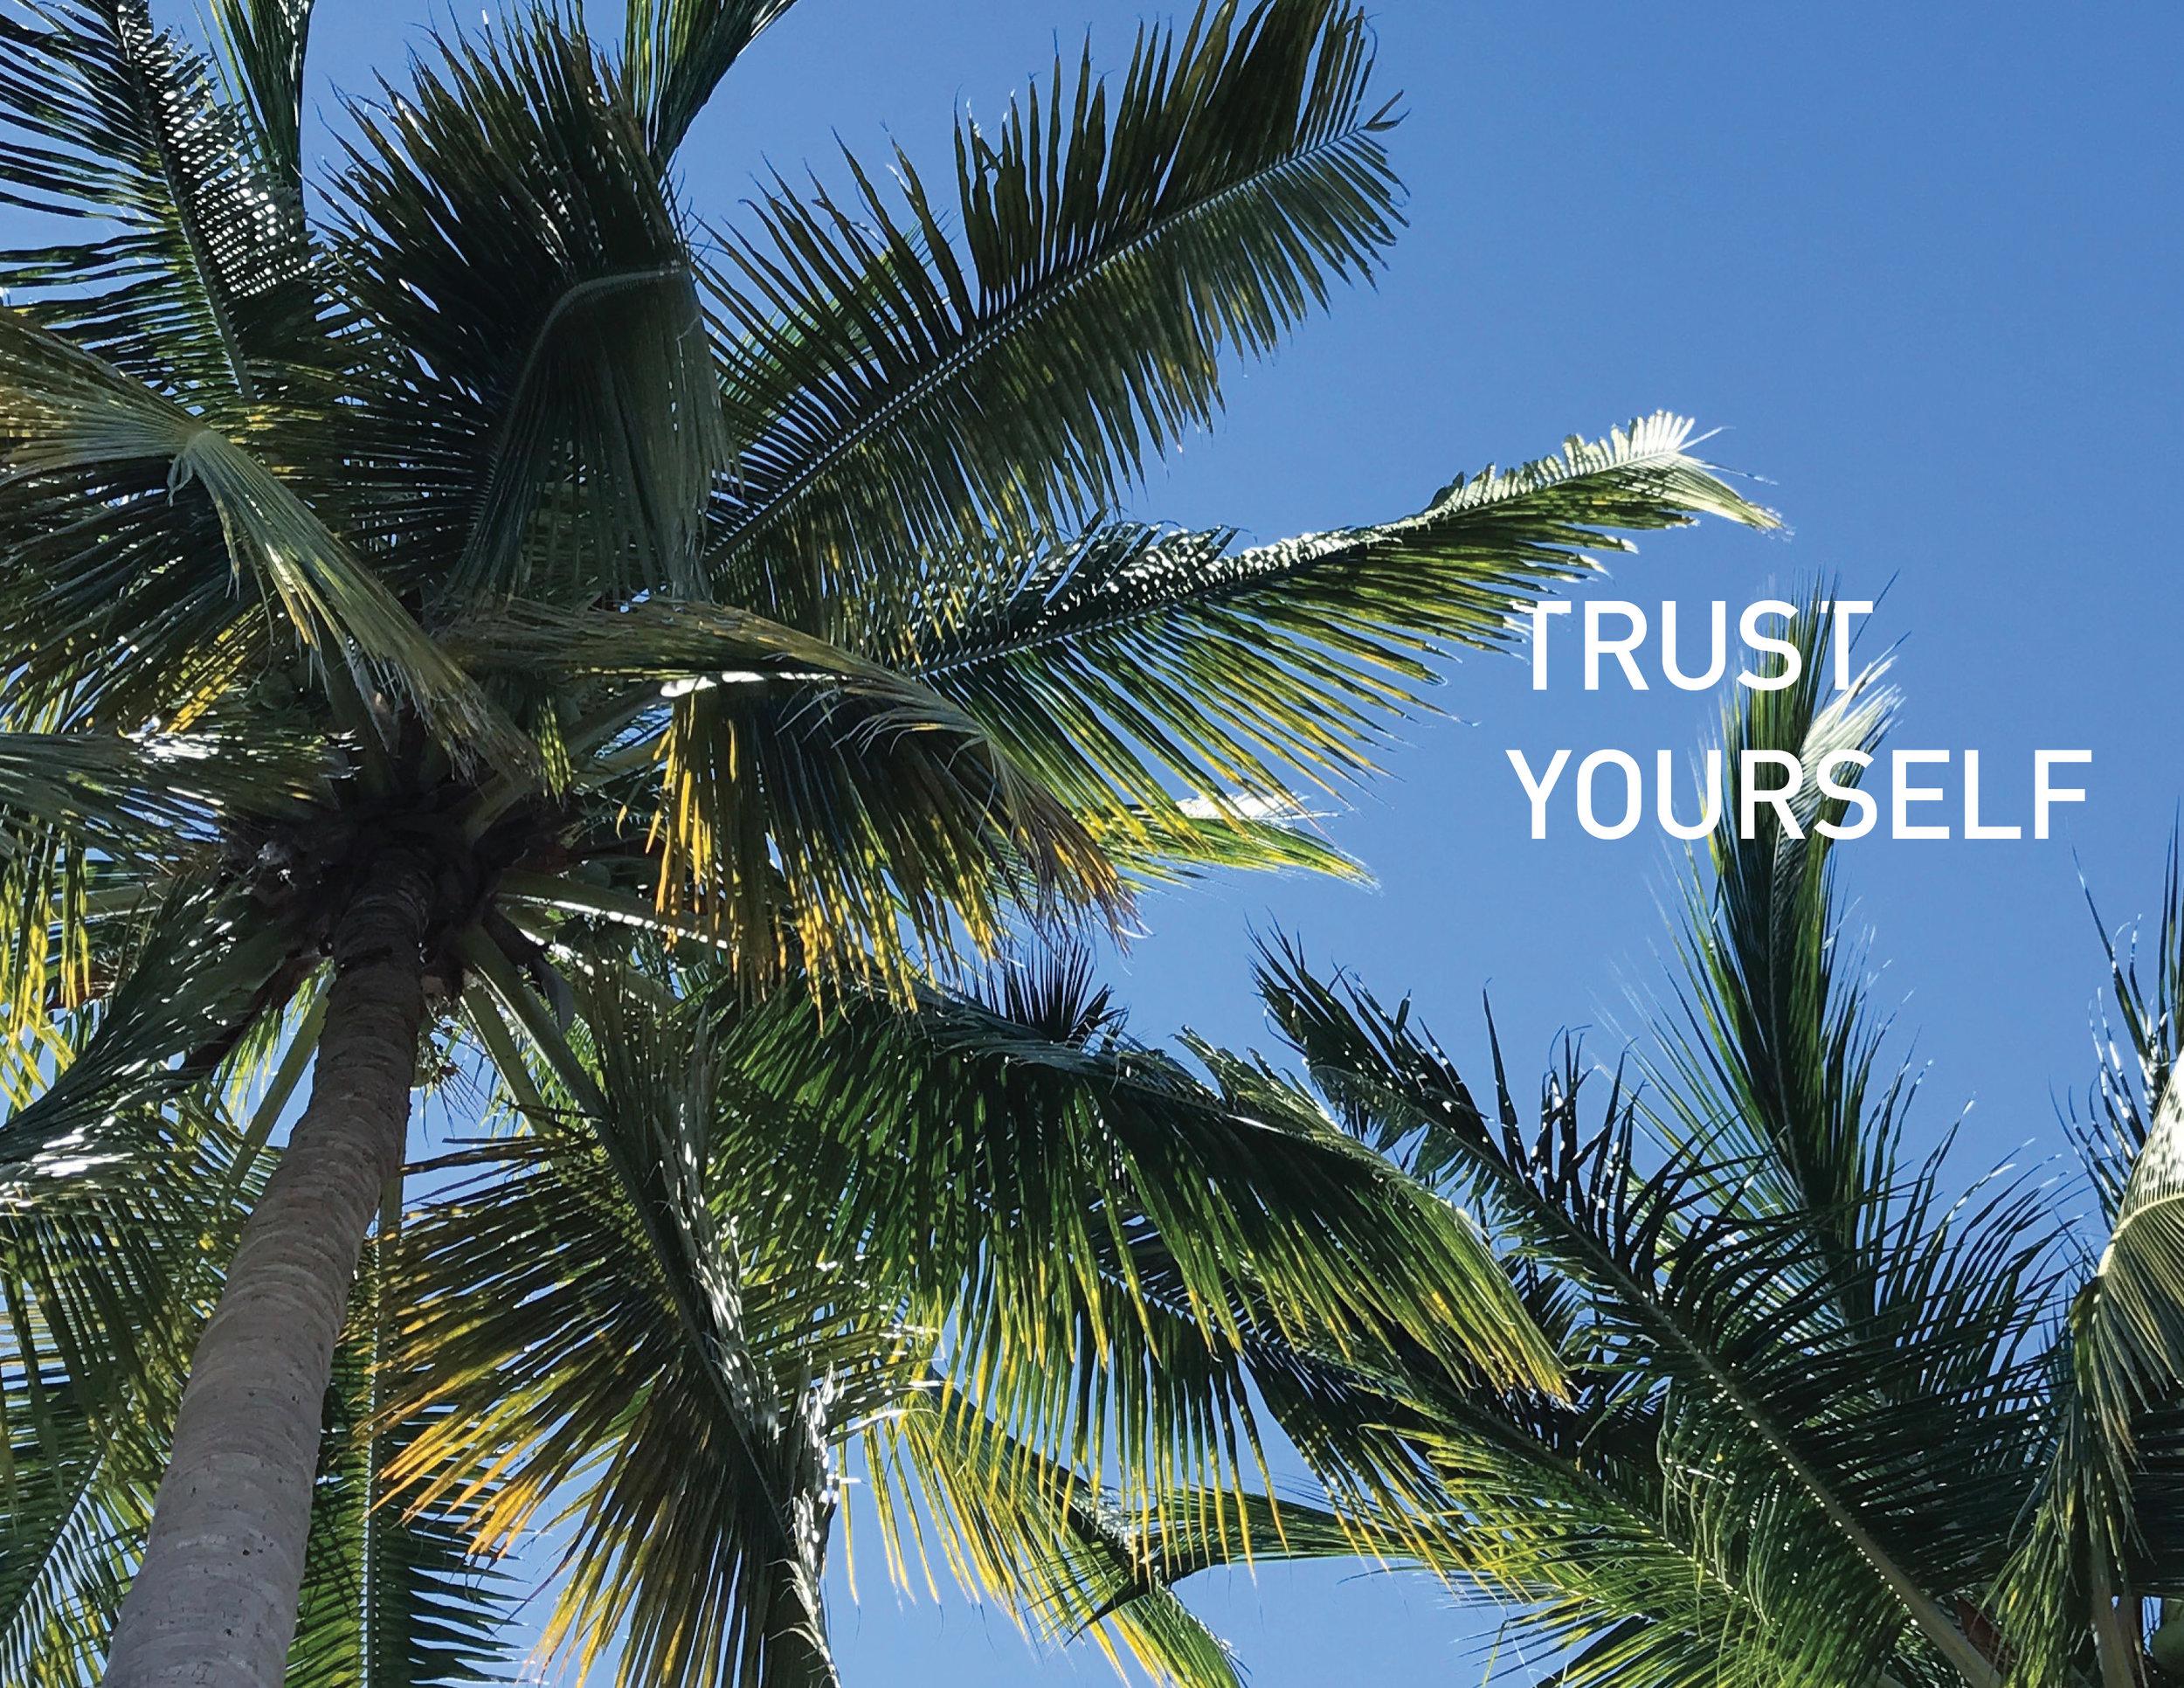 EATSTRETCHNAP-trustyourself_pg-001.jpg